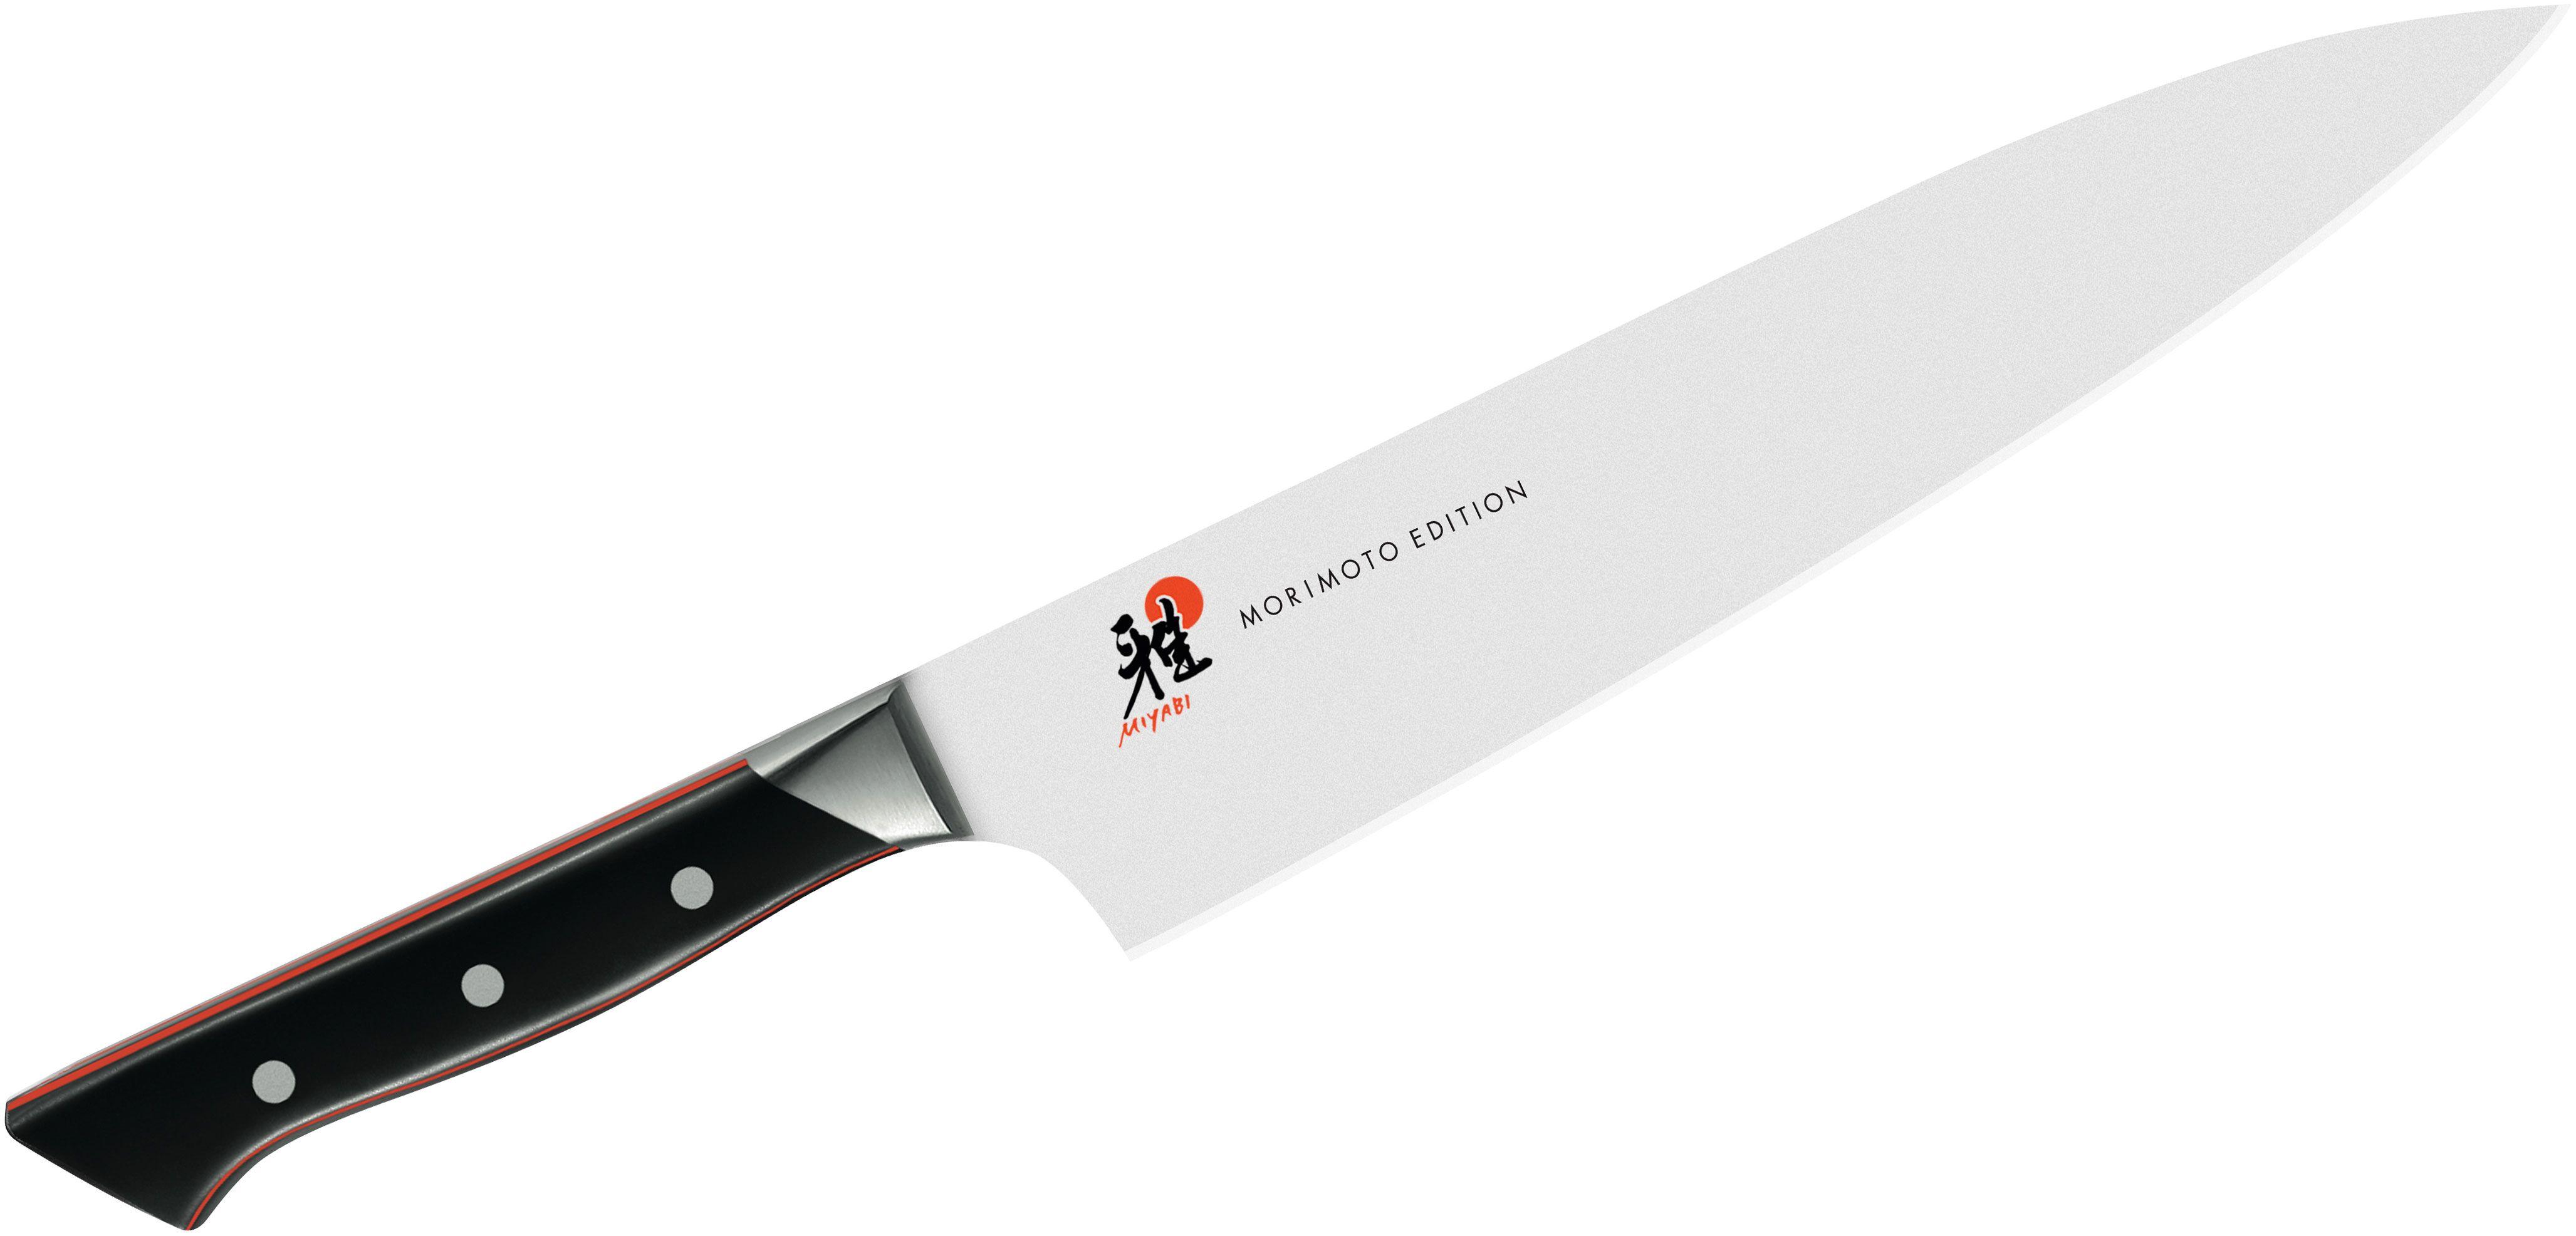 Zwilling J.A. Henckels Miyabi Red 600S Morimoto 9.5 inch Chef's Knife